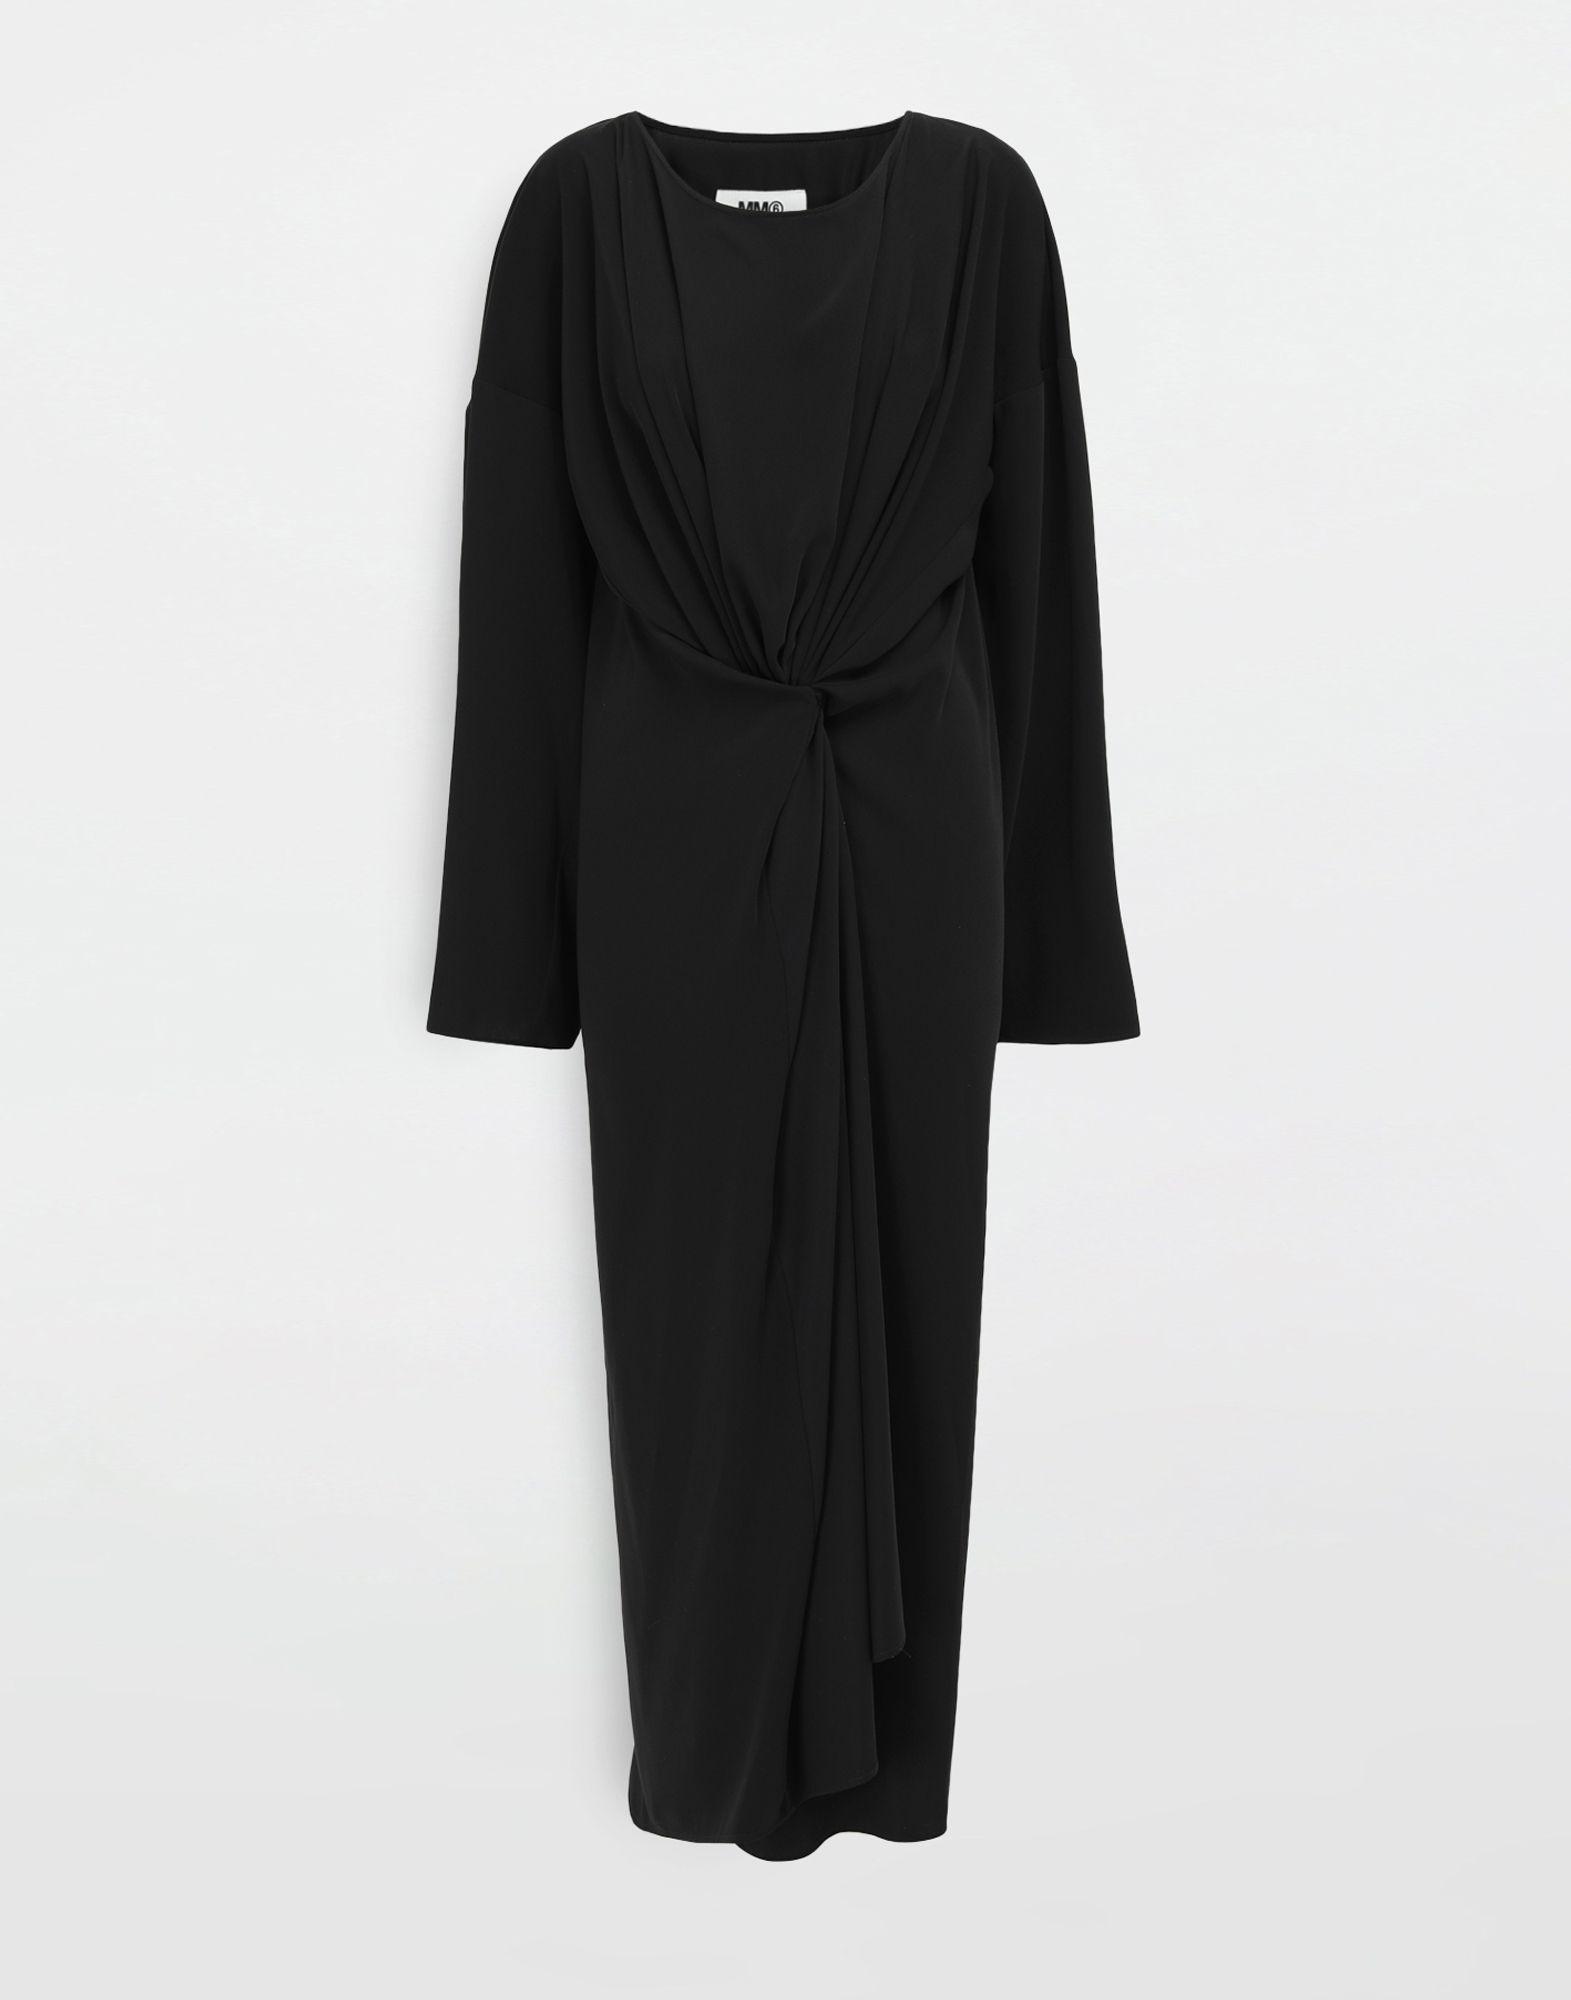 MM6 MAISON MARGIELA Draped maxi dress Long dress Woman f